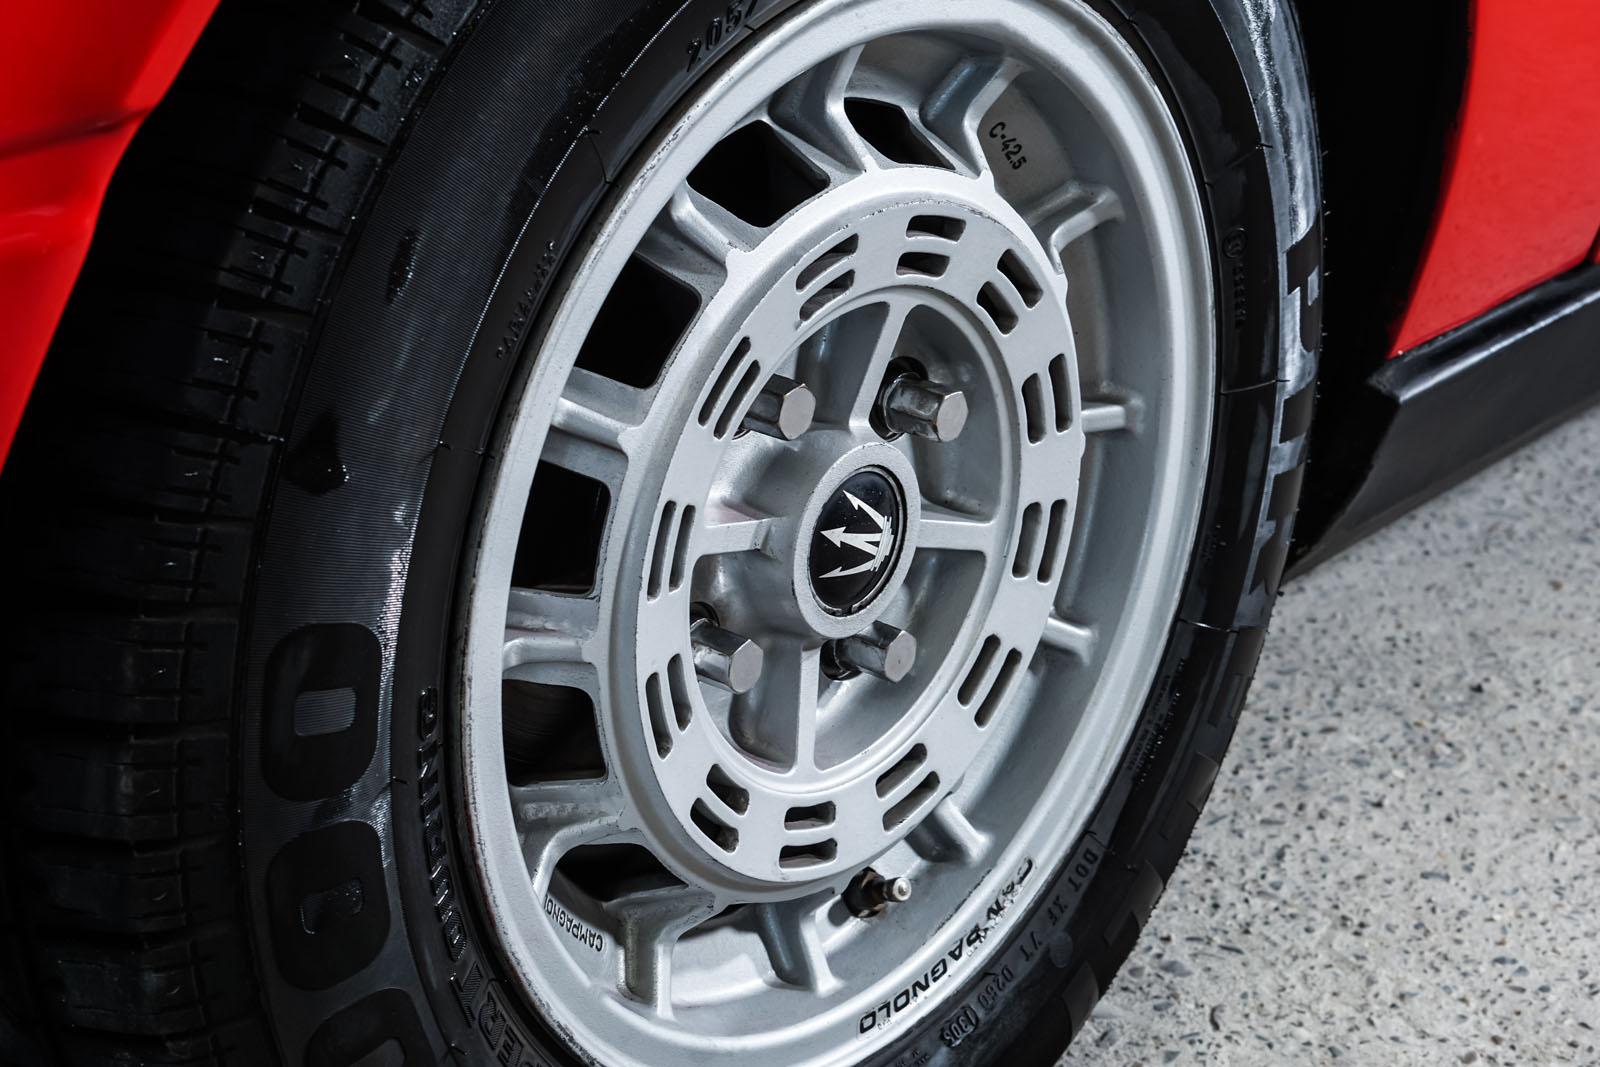 Maserati_Merak_Rot_Schwarz_MAS-4094_9_w